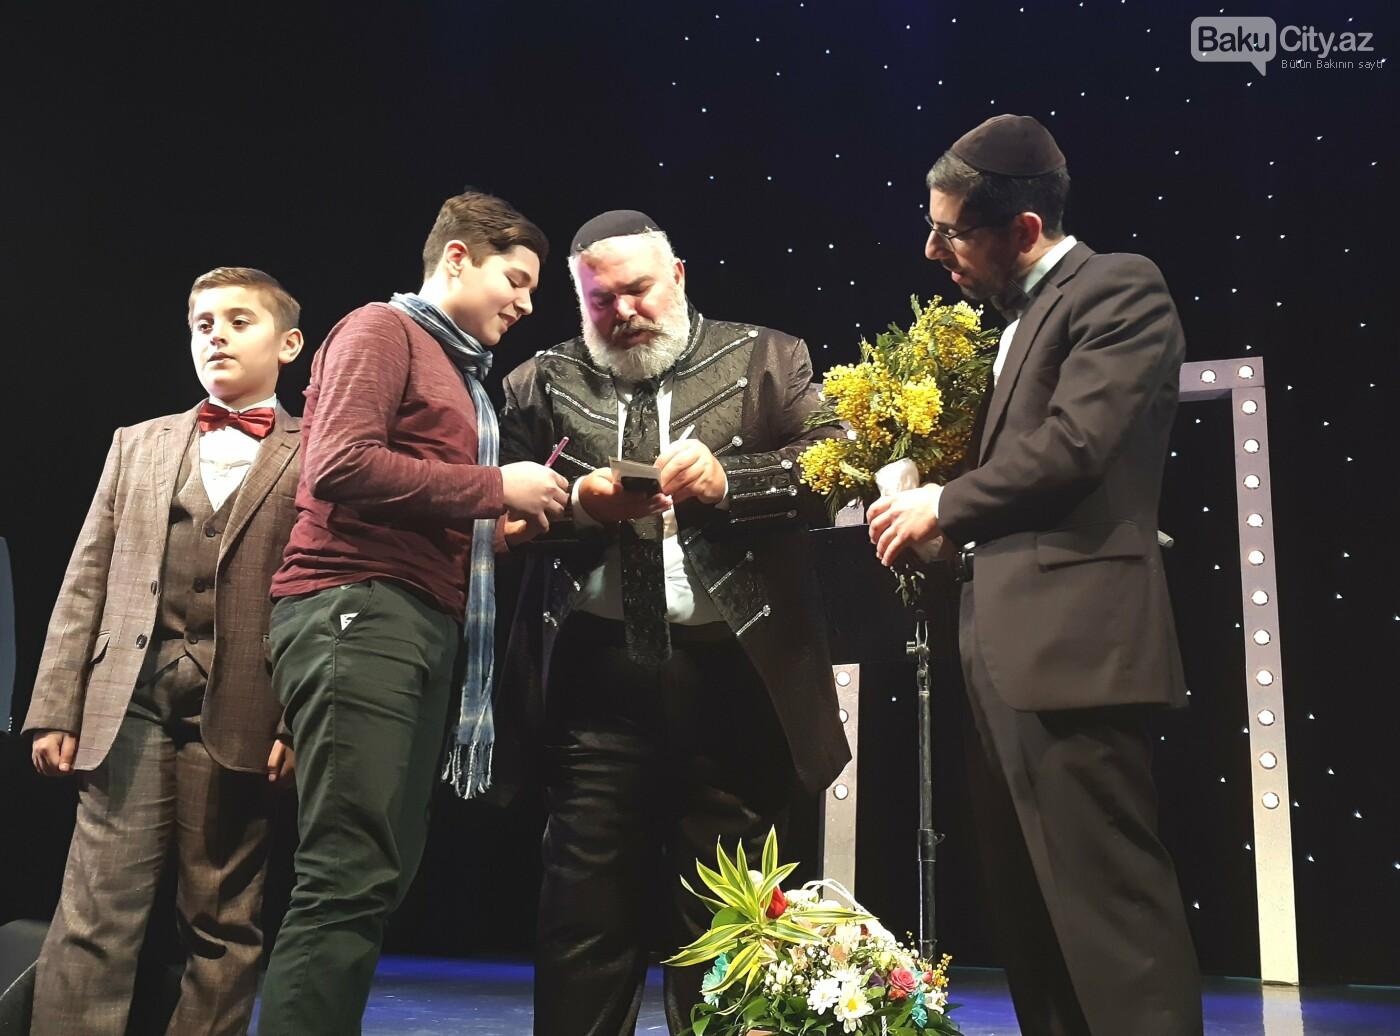 Bakıda tanınmış flamenko ifaçısısı konsert verdi – FOTO/VİDEO, fotoşəkil-26